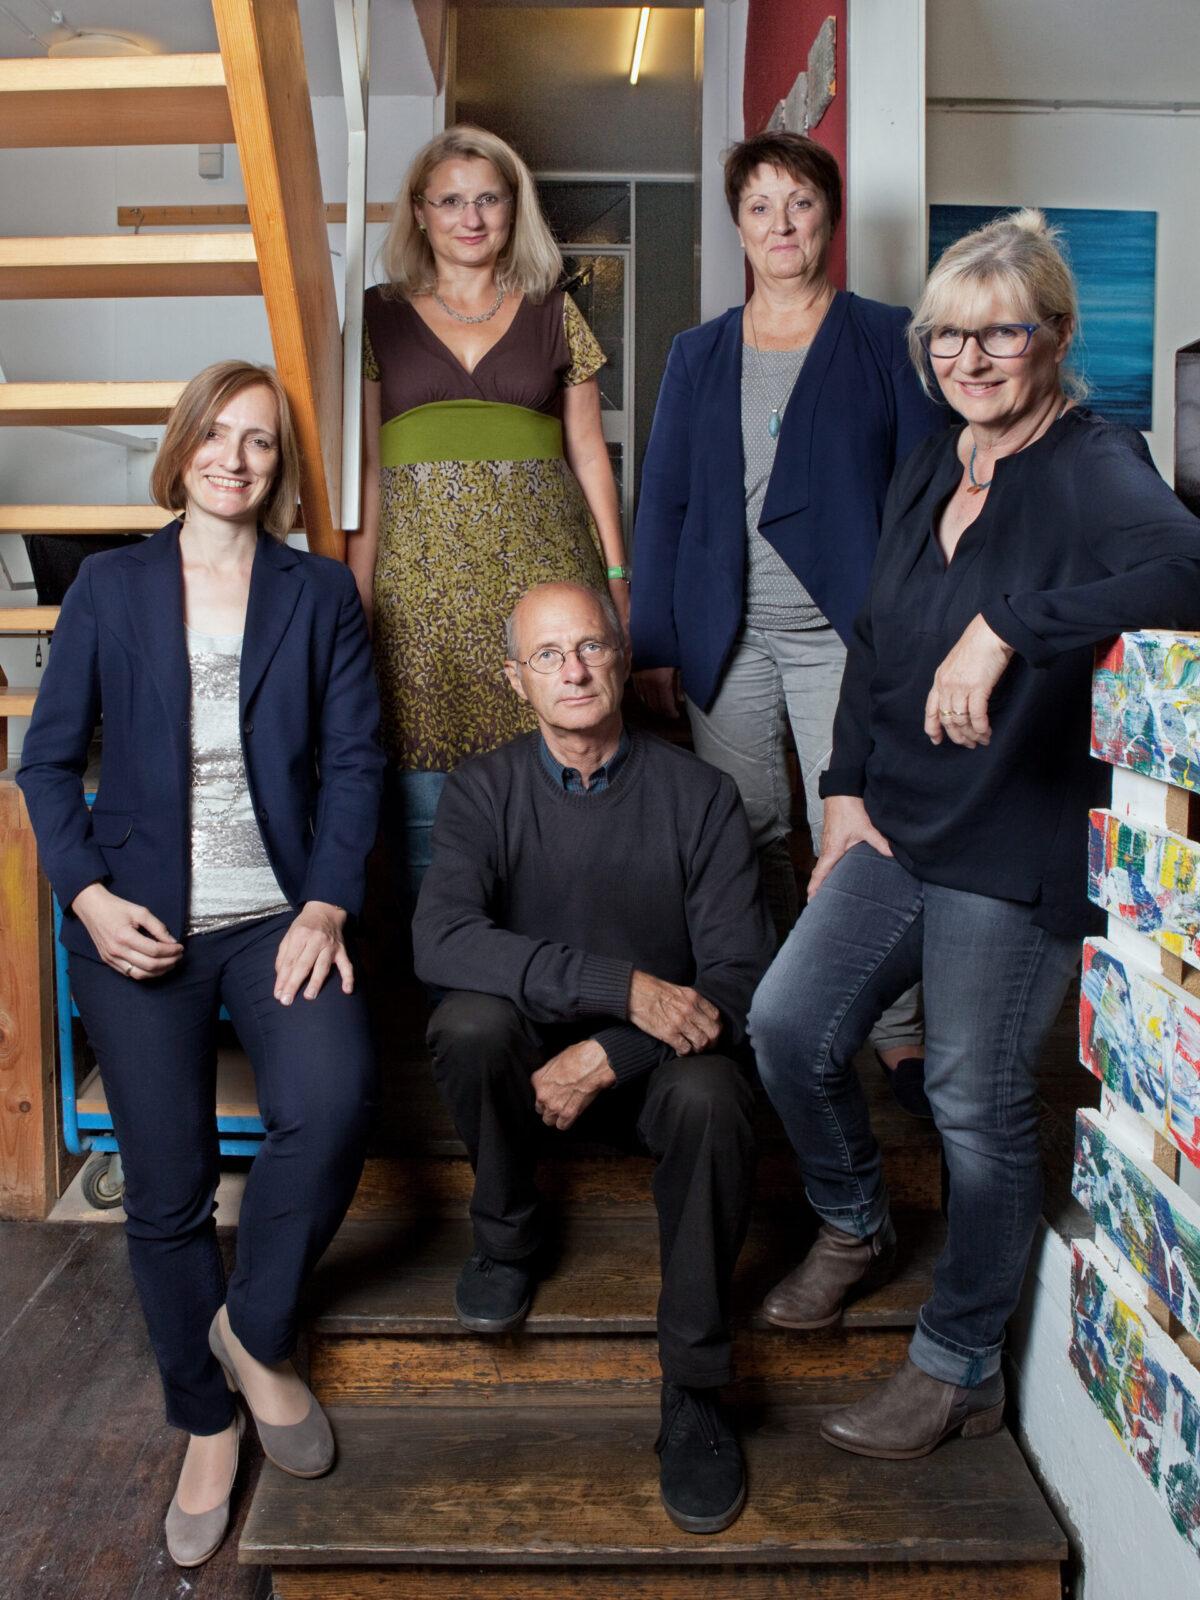 Atelier Möttelin: v.l.n.r.: Carola WeberSchlak; Christine Krause, Rainer Klass, Ingrid Müller, Elke Czudai